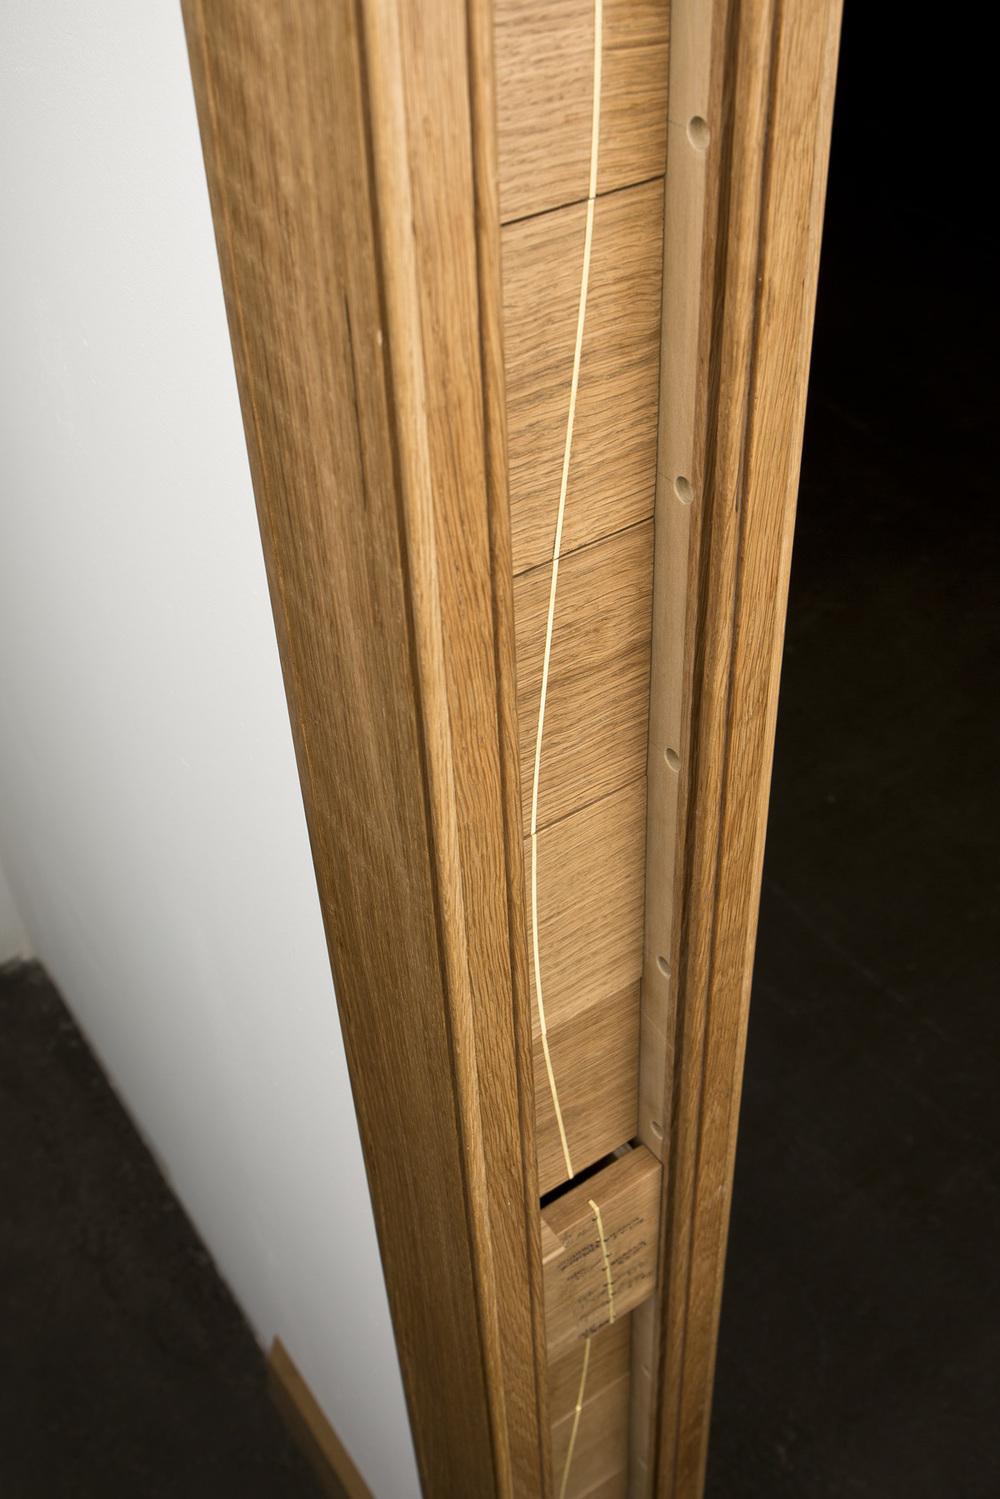 wall chest drawers hidden